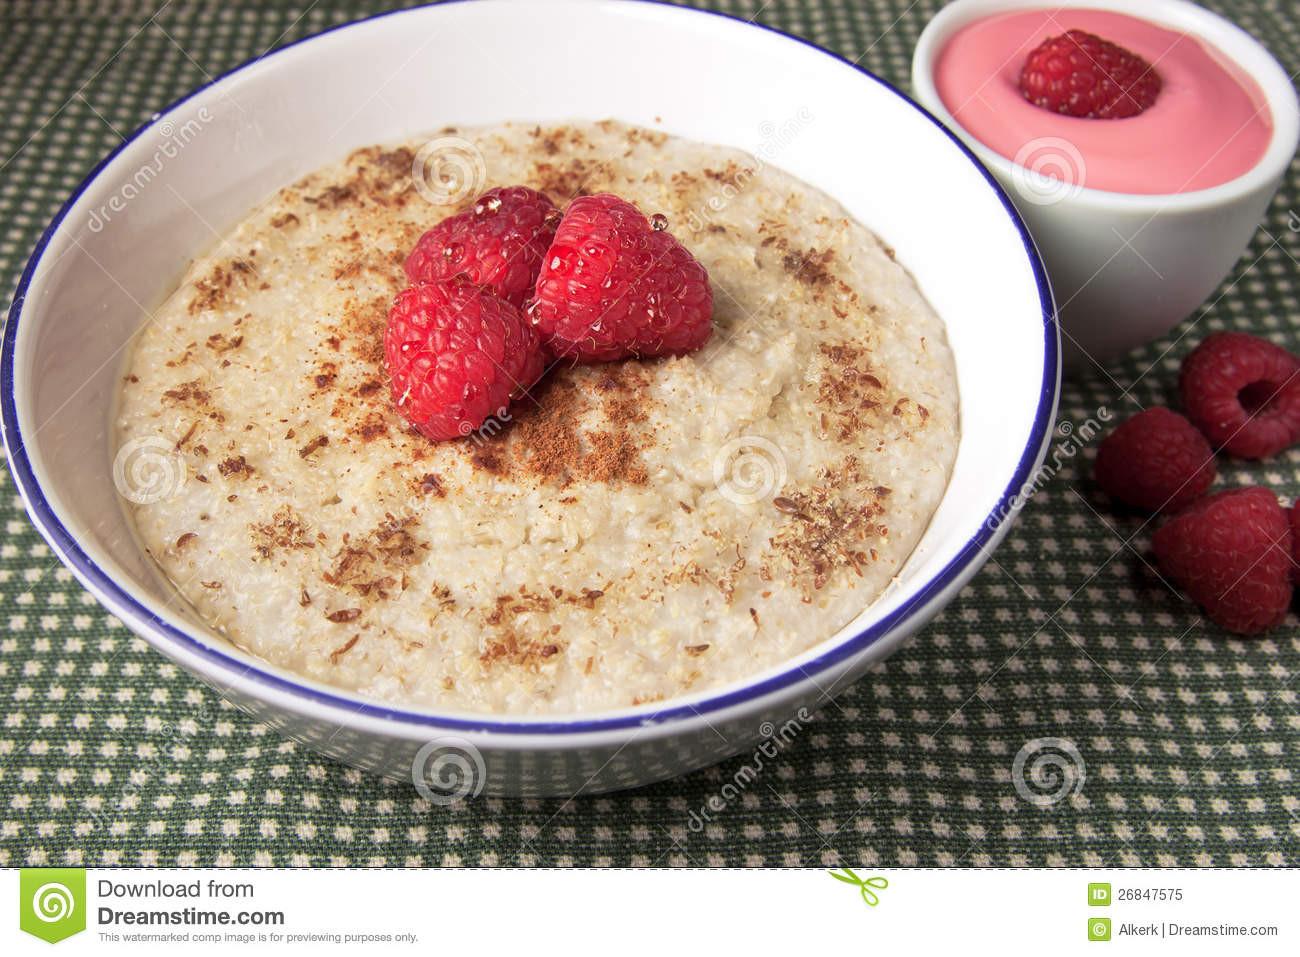 Healthy Hot Breakfast  Healthy Breakfast Hot Oat Bran Cereal Stock Image